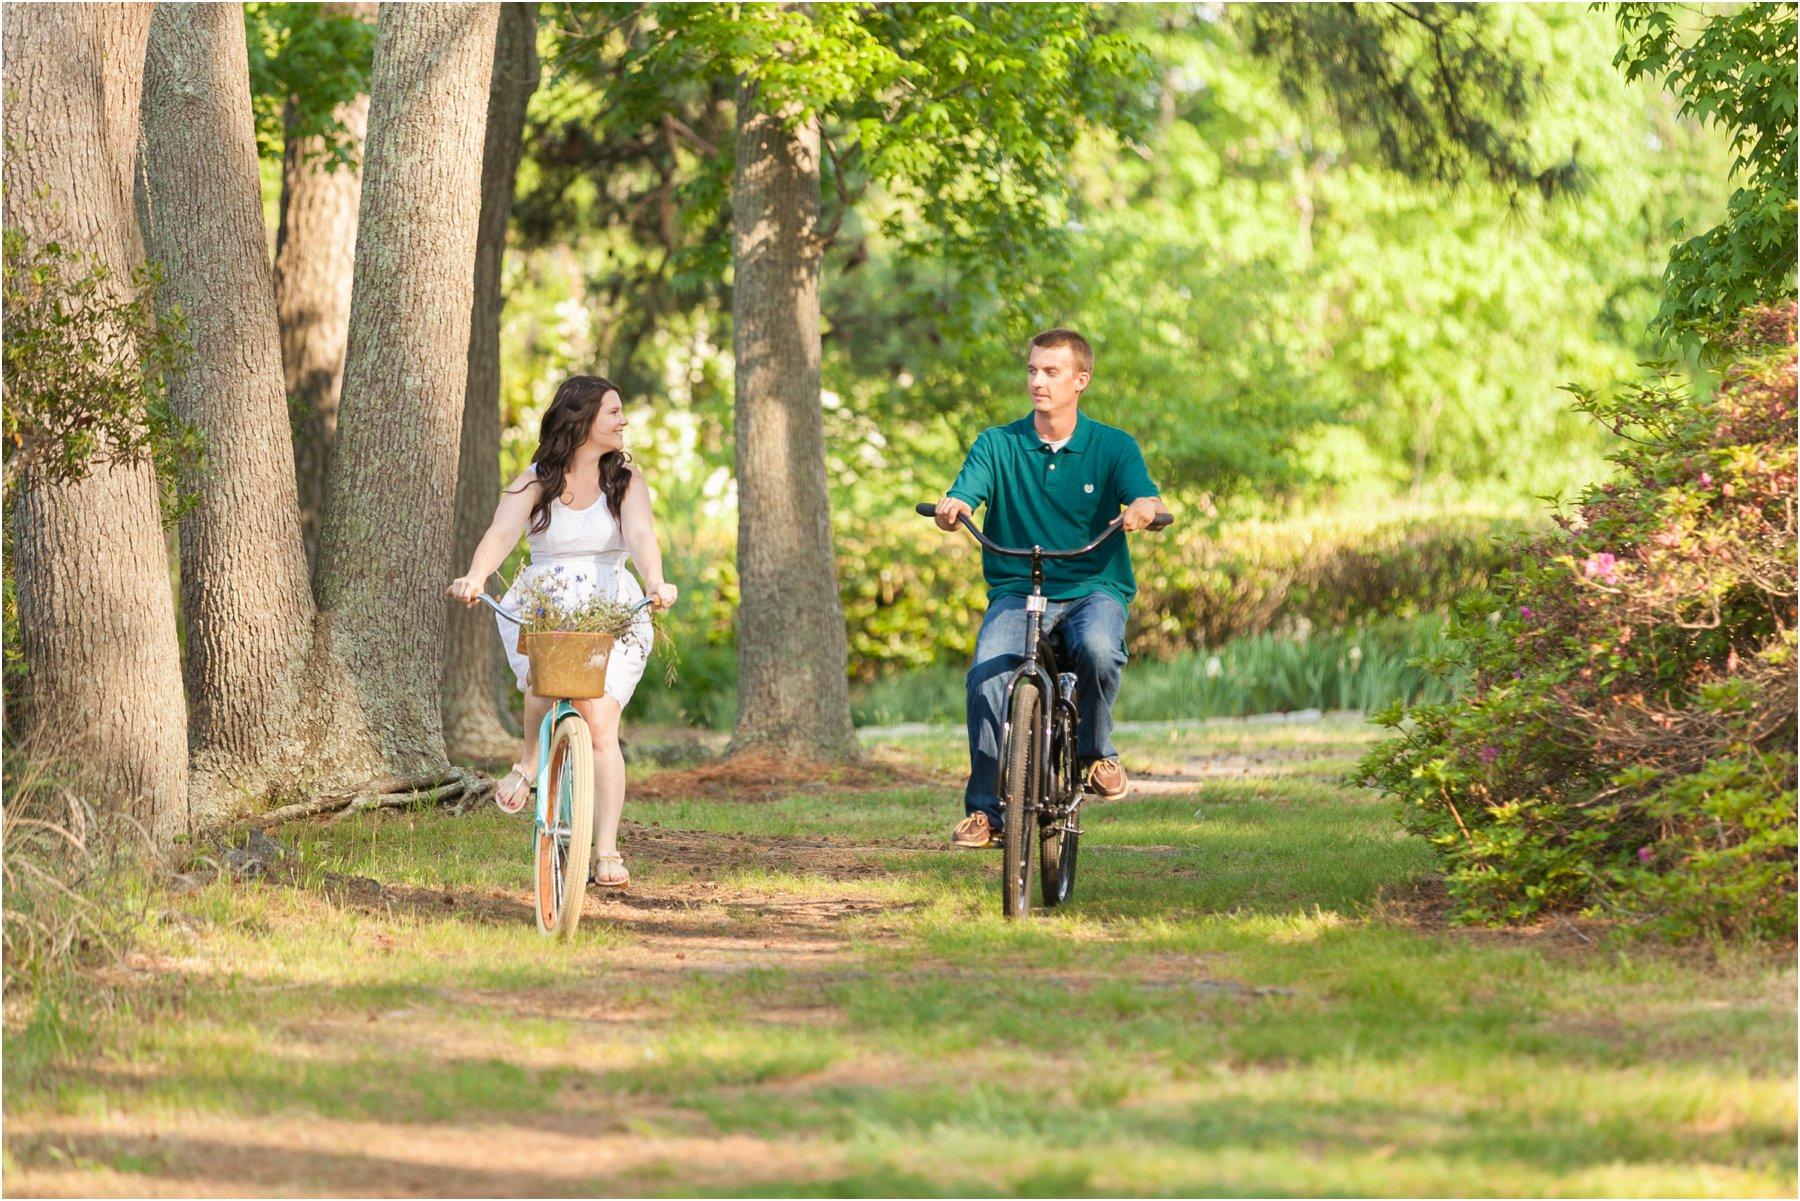 engagement_Photography_bike_ride_engagements_Jessica_Ryan_Photography_virginia_virginia_beach_0315